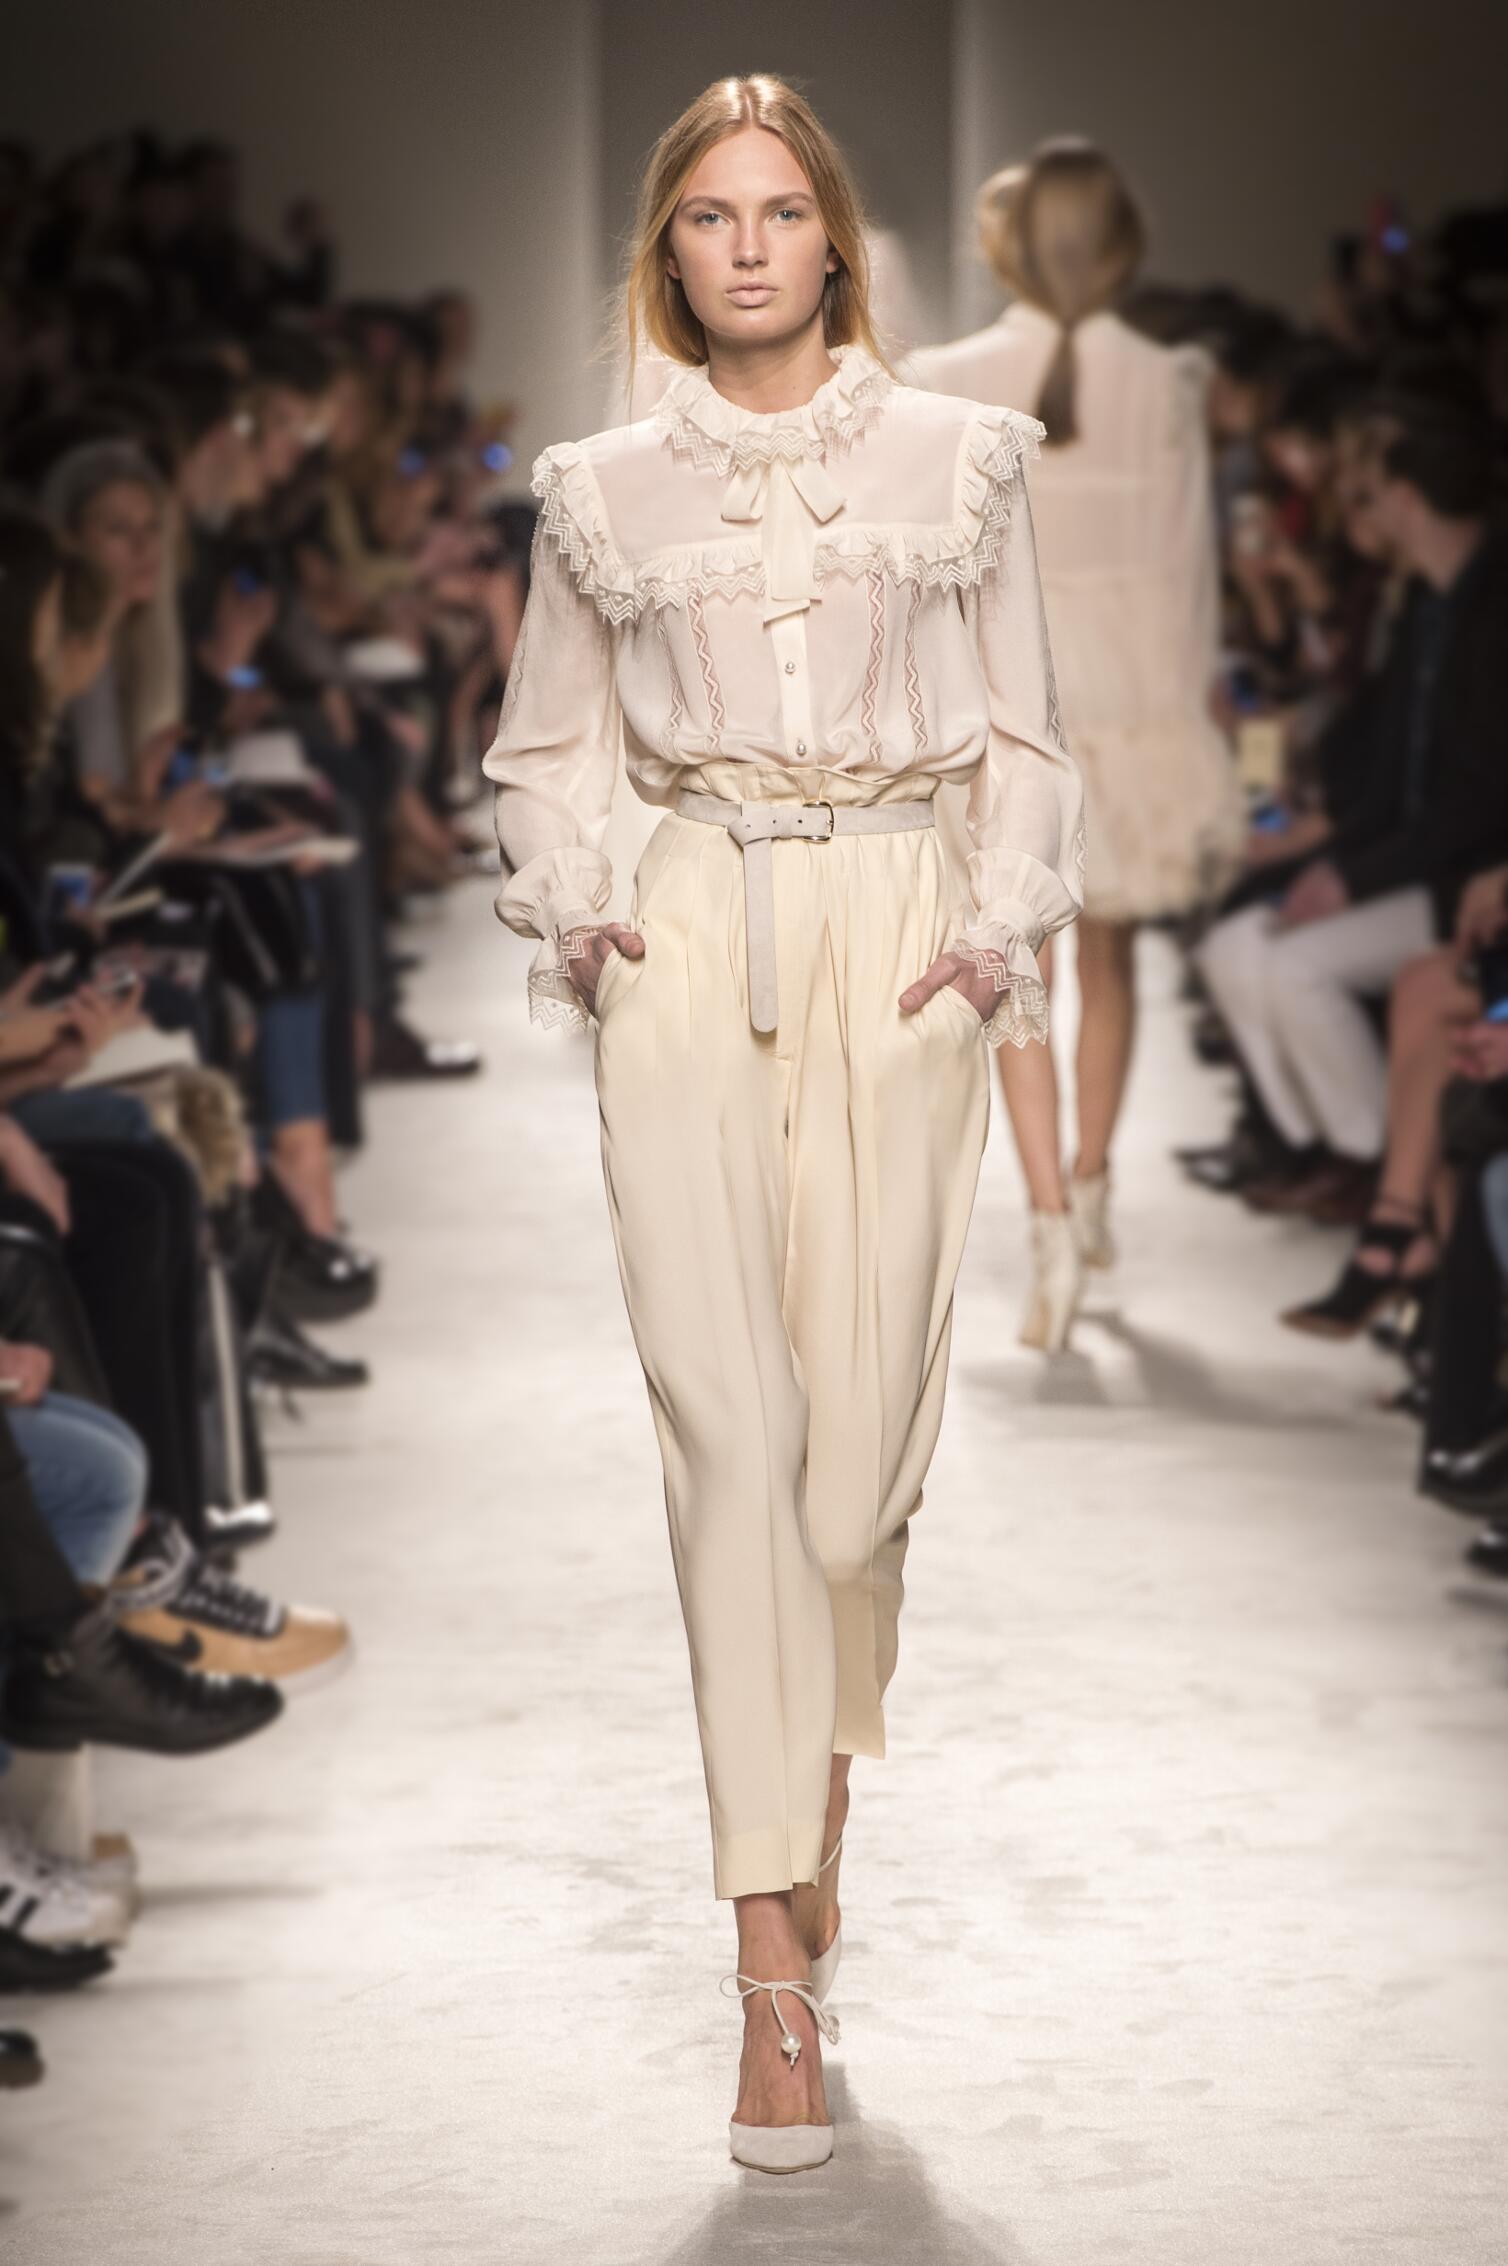 Fall Winter 2015 16 Fashion Collection Philosophy di Lorenzo Serafini